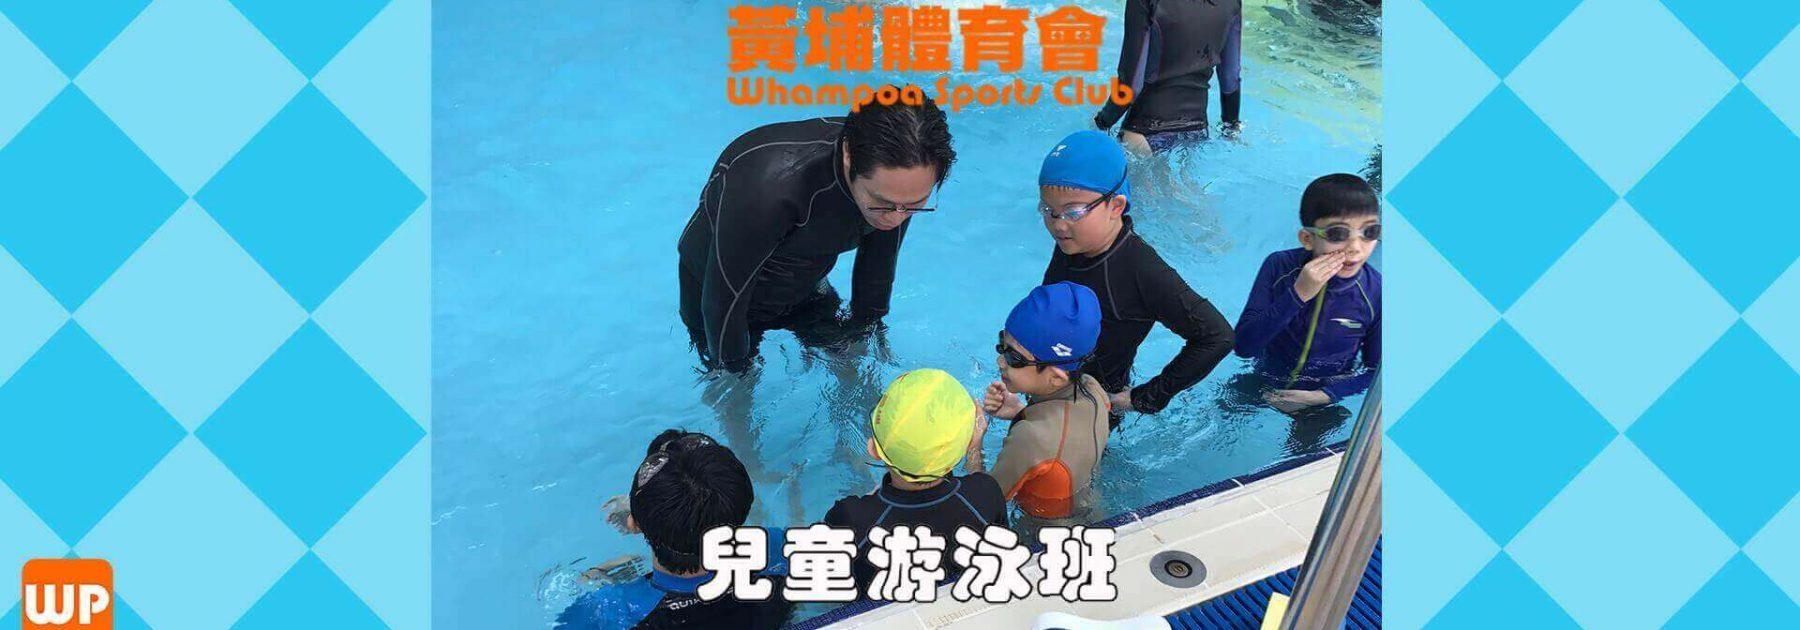 小組兒童游泳班 banner